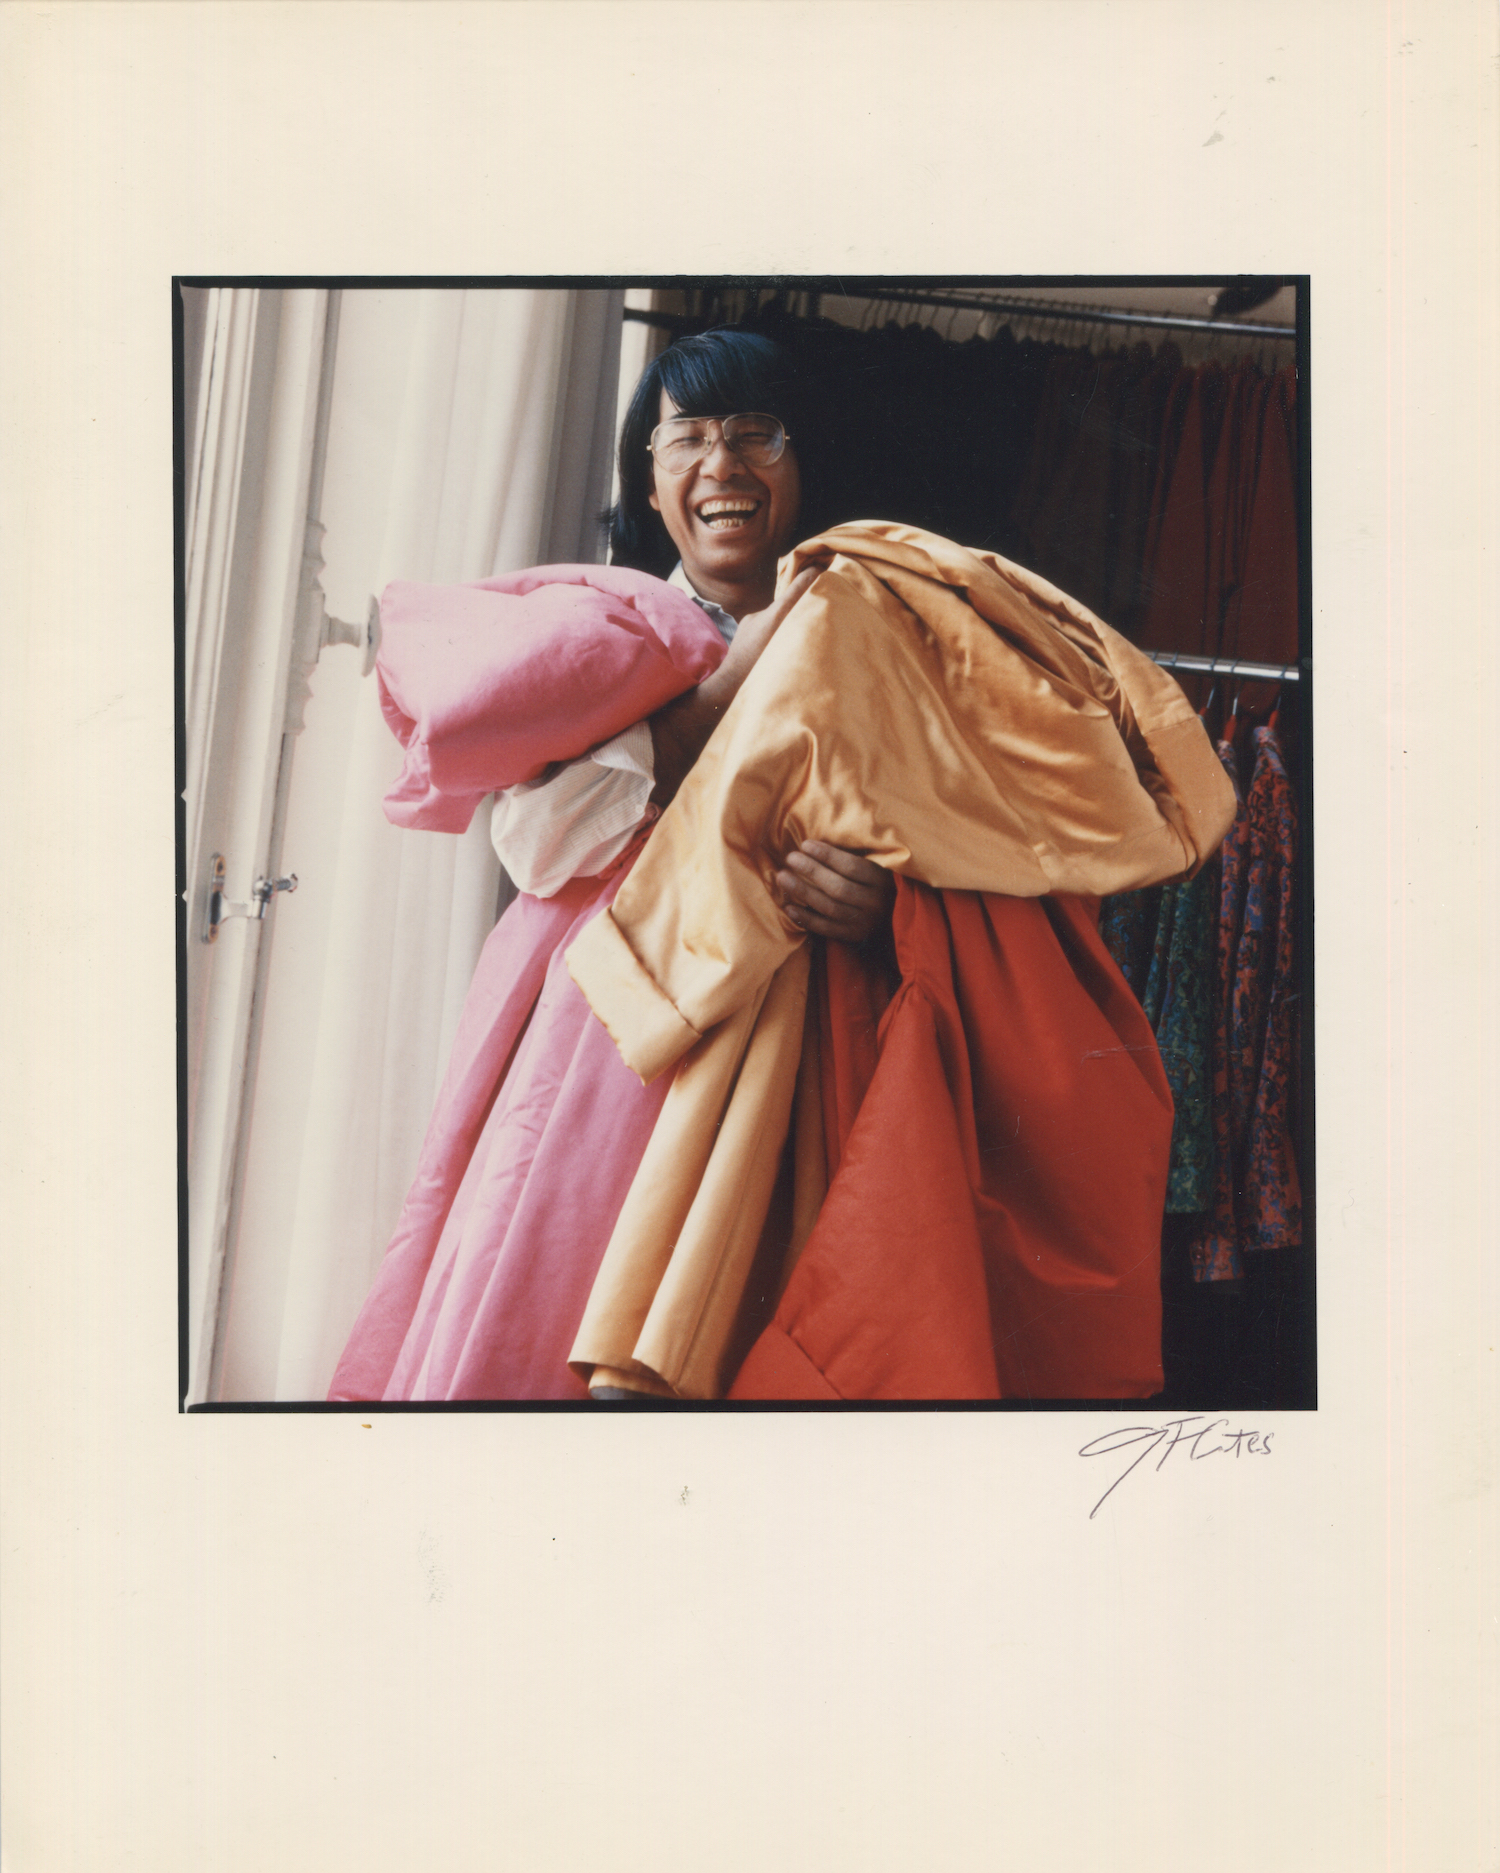 Kenzo Takada smiling, holding colourful looks